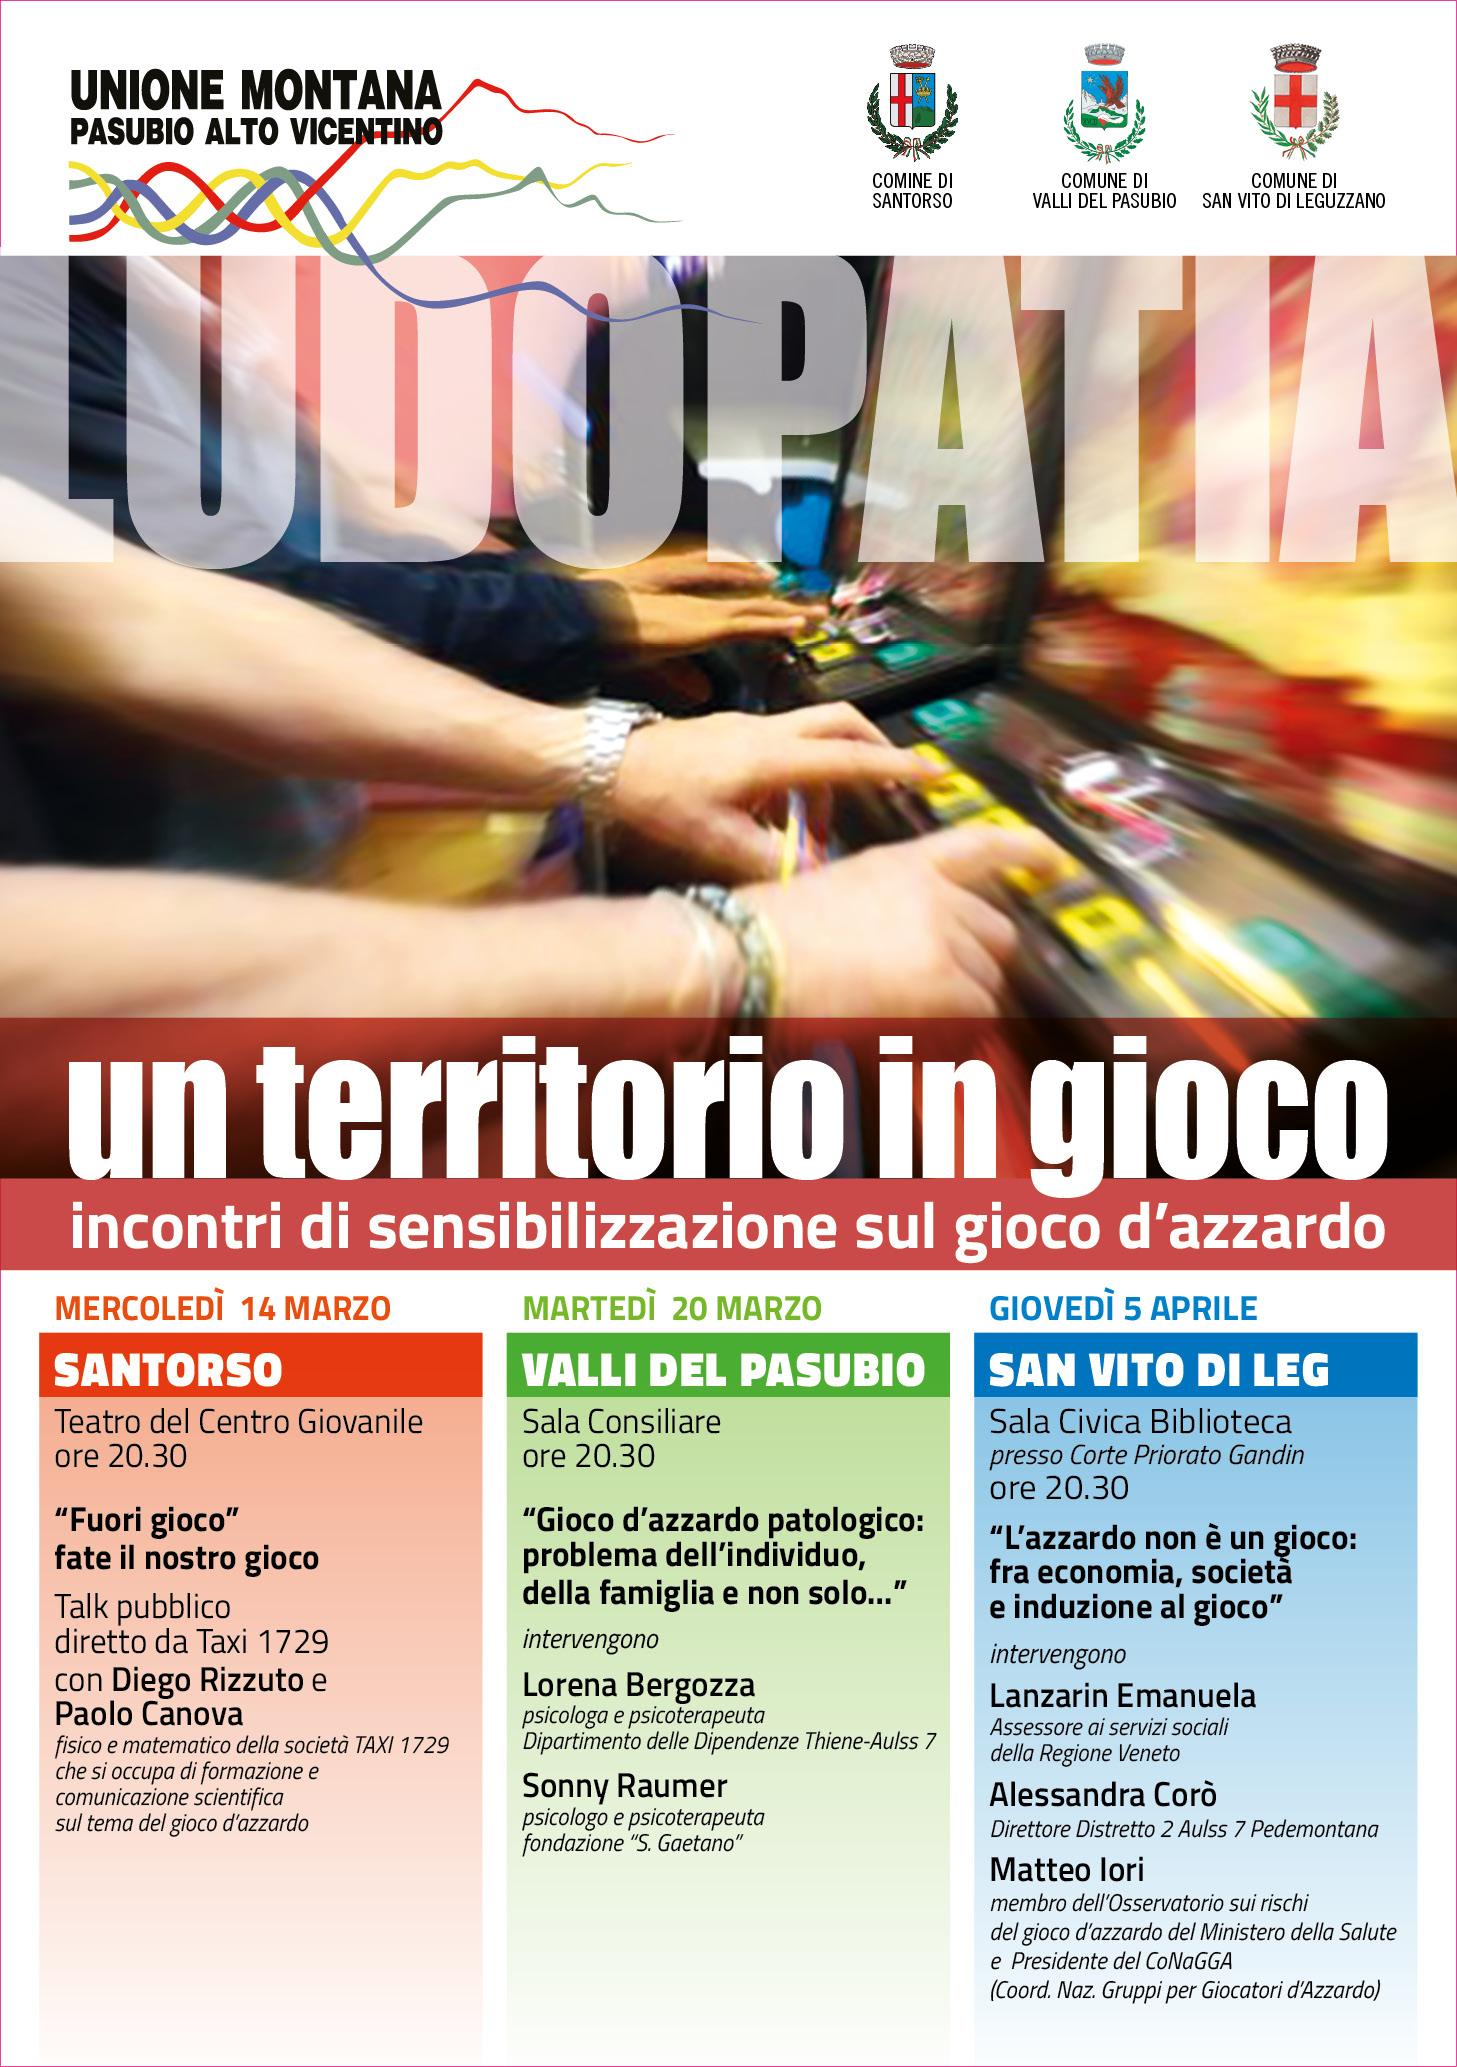 LUDOPATIA Santorso Valli S. Vito 05 03 2018 (1)